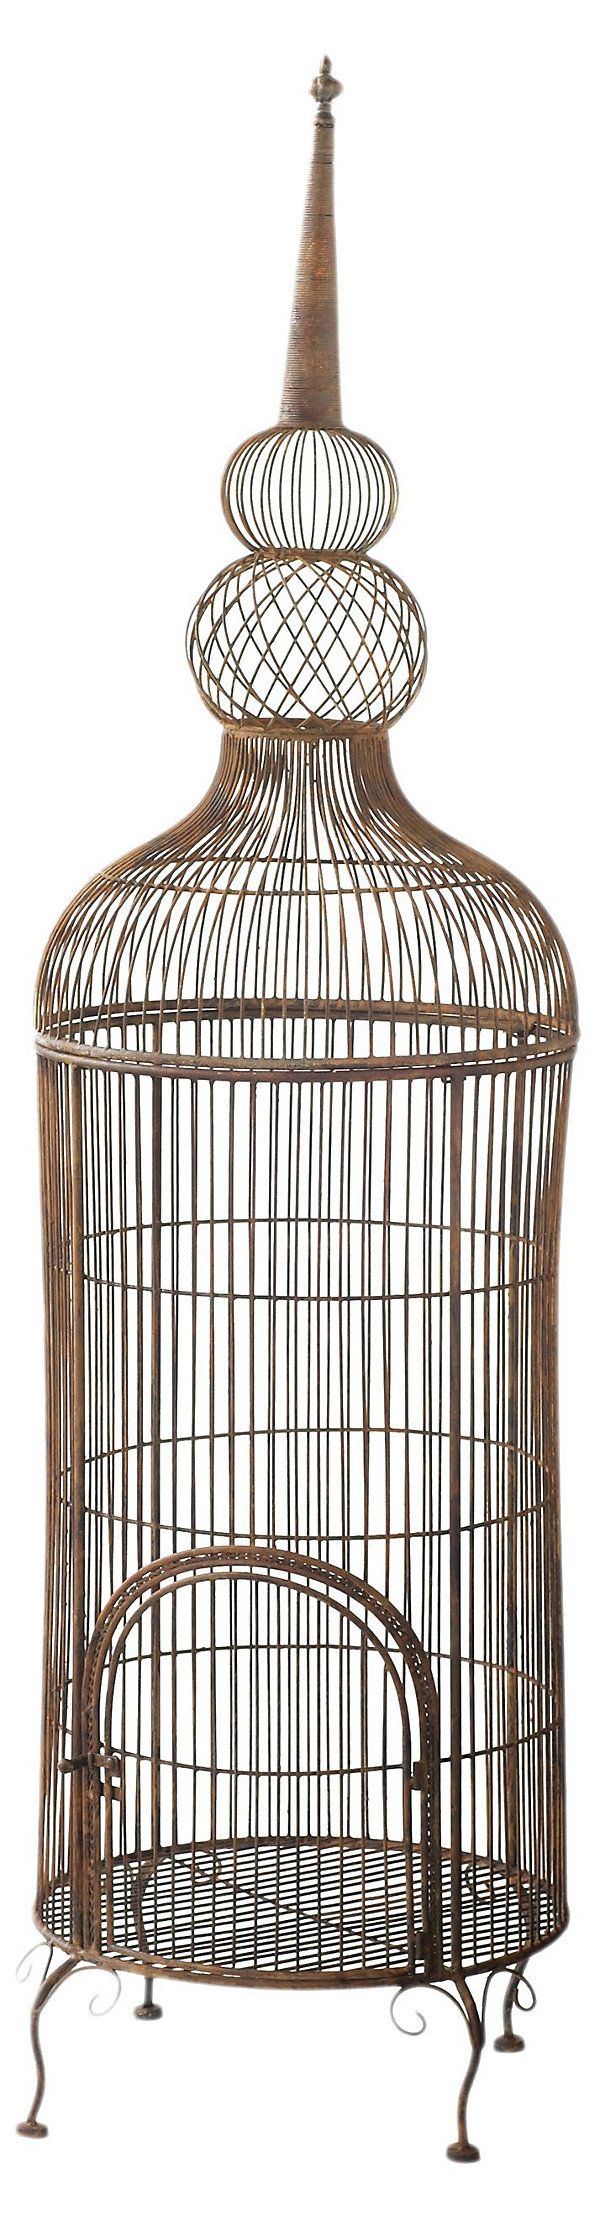 "74"" Standing Birdcage, Bronze | An Enchanted Evening | One Kings Lane"